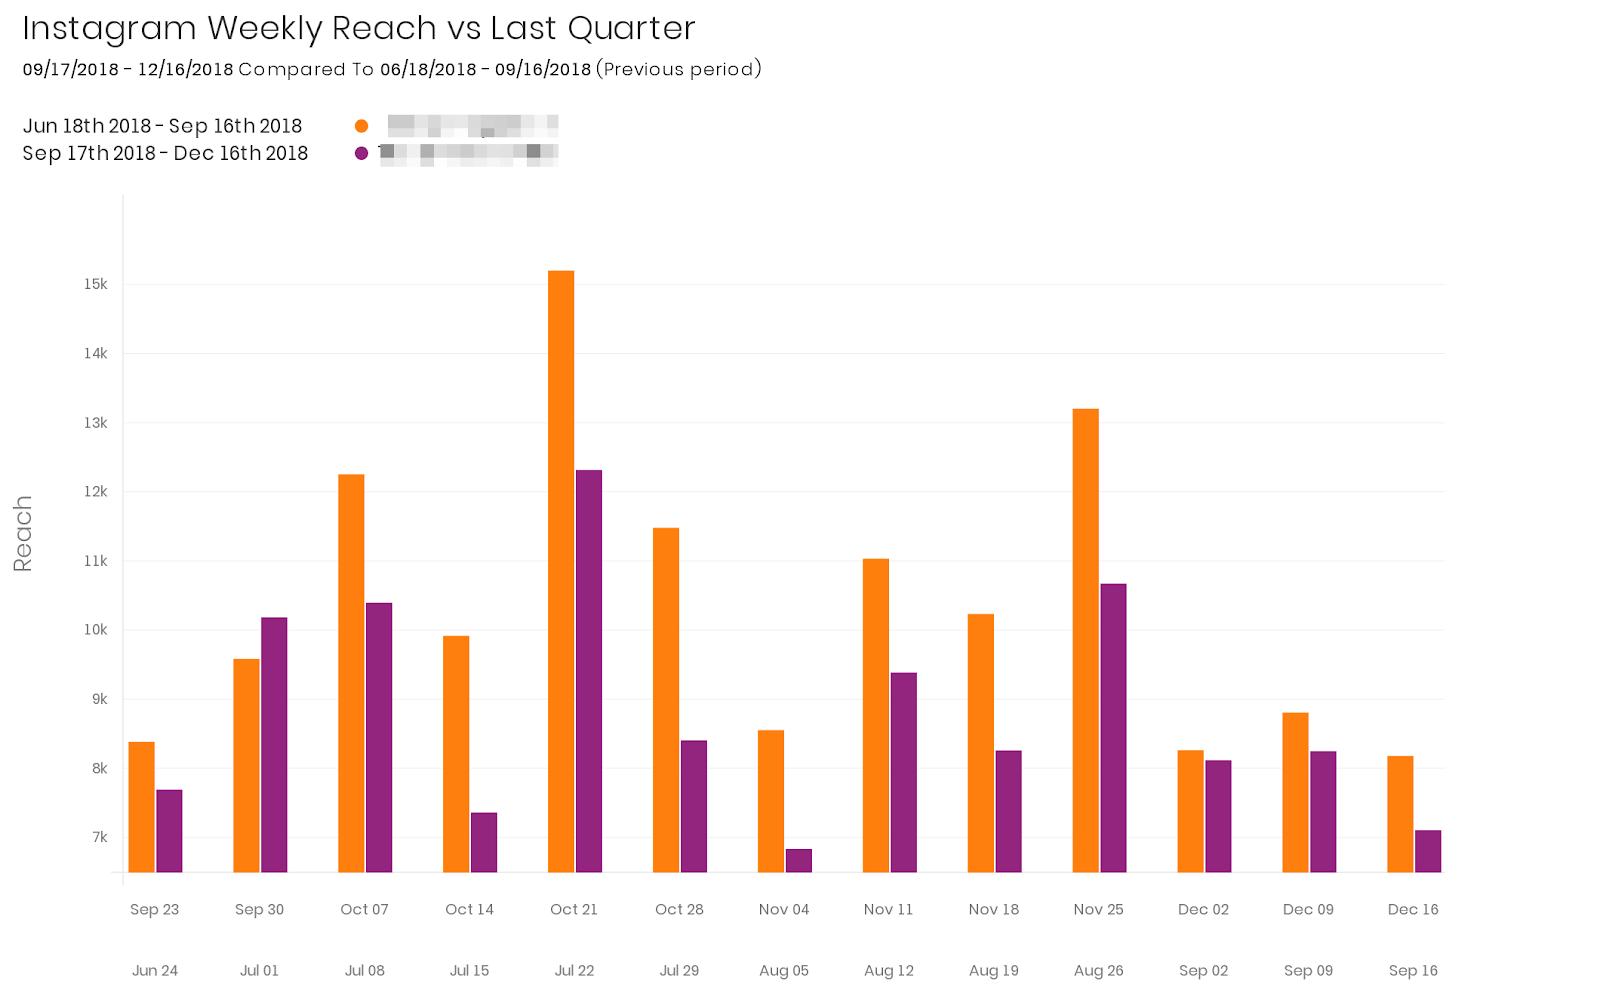 insta-reach-vs-last-quarter